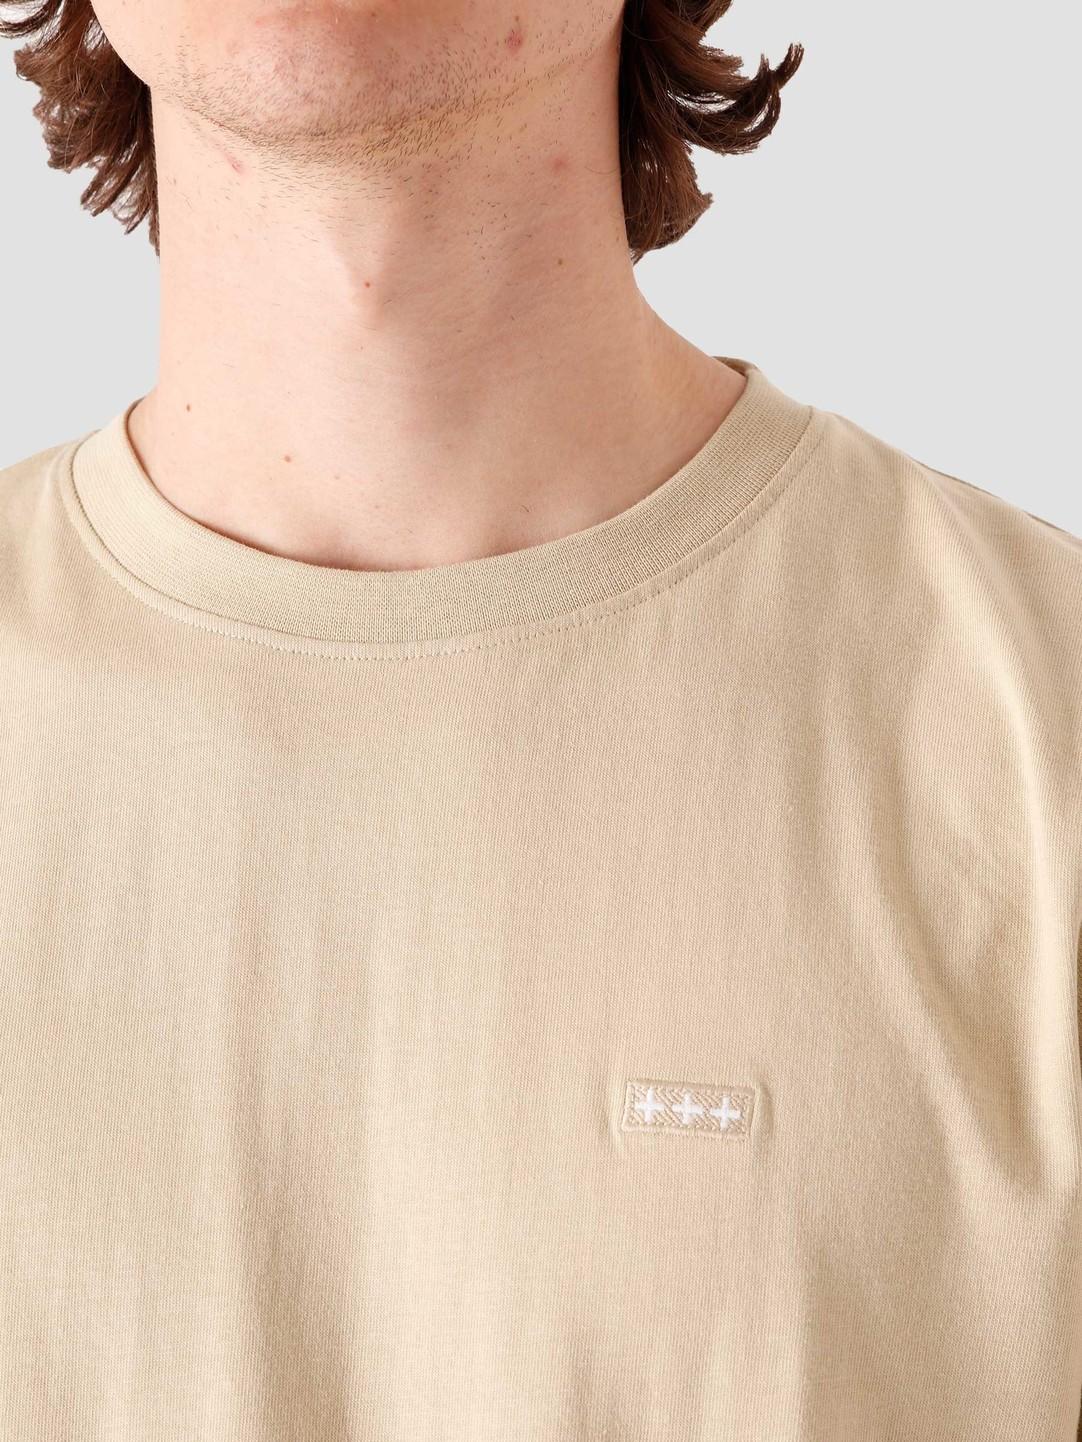 Quality Blanks Quality Blanks QB03 Patch Logo T-shirt Beige